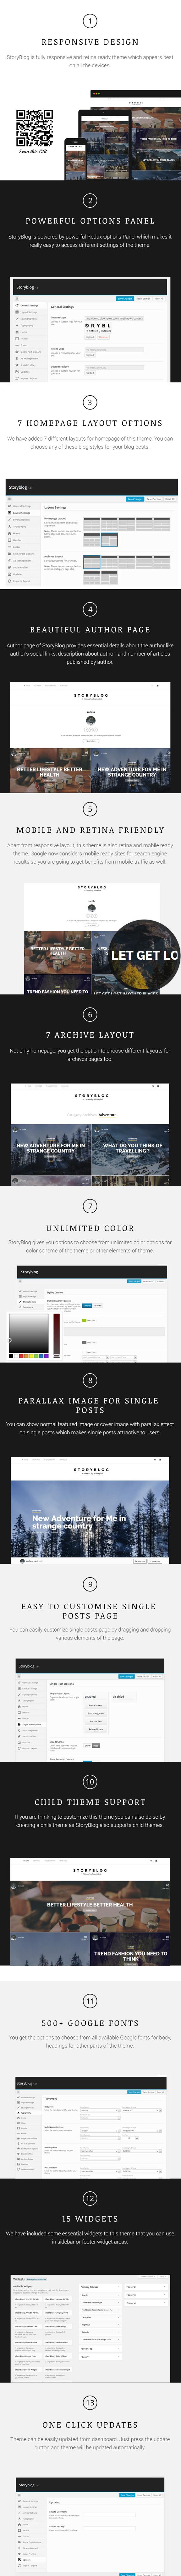 StoryBlog - WordPress Theme for Story Tellers - 2